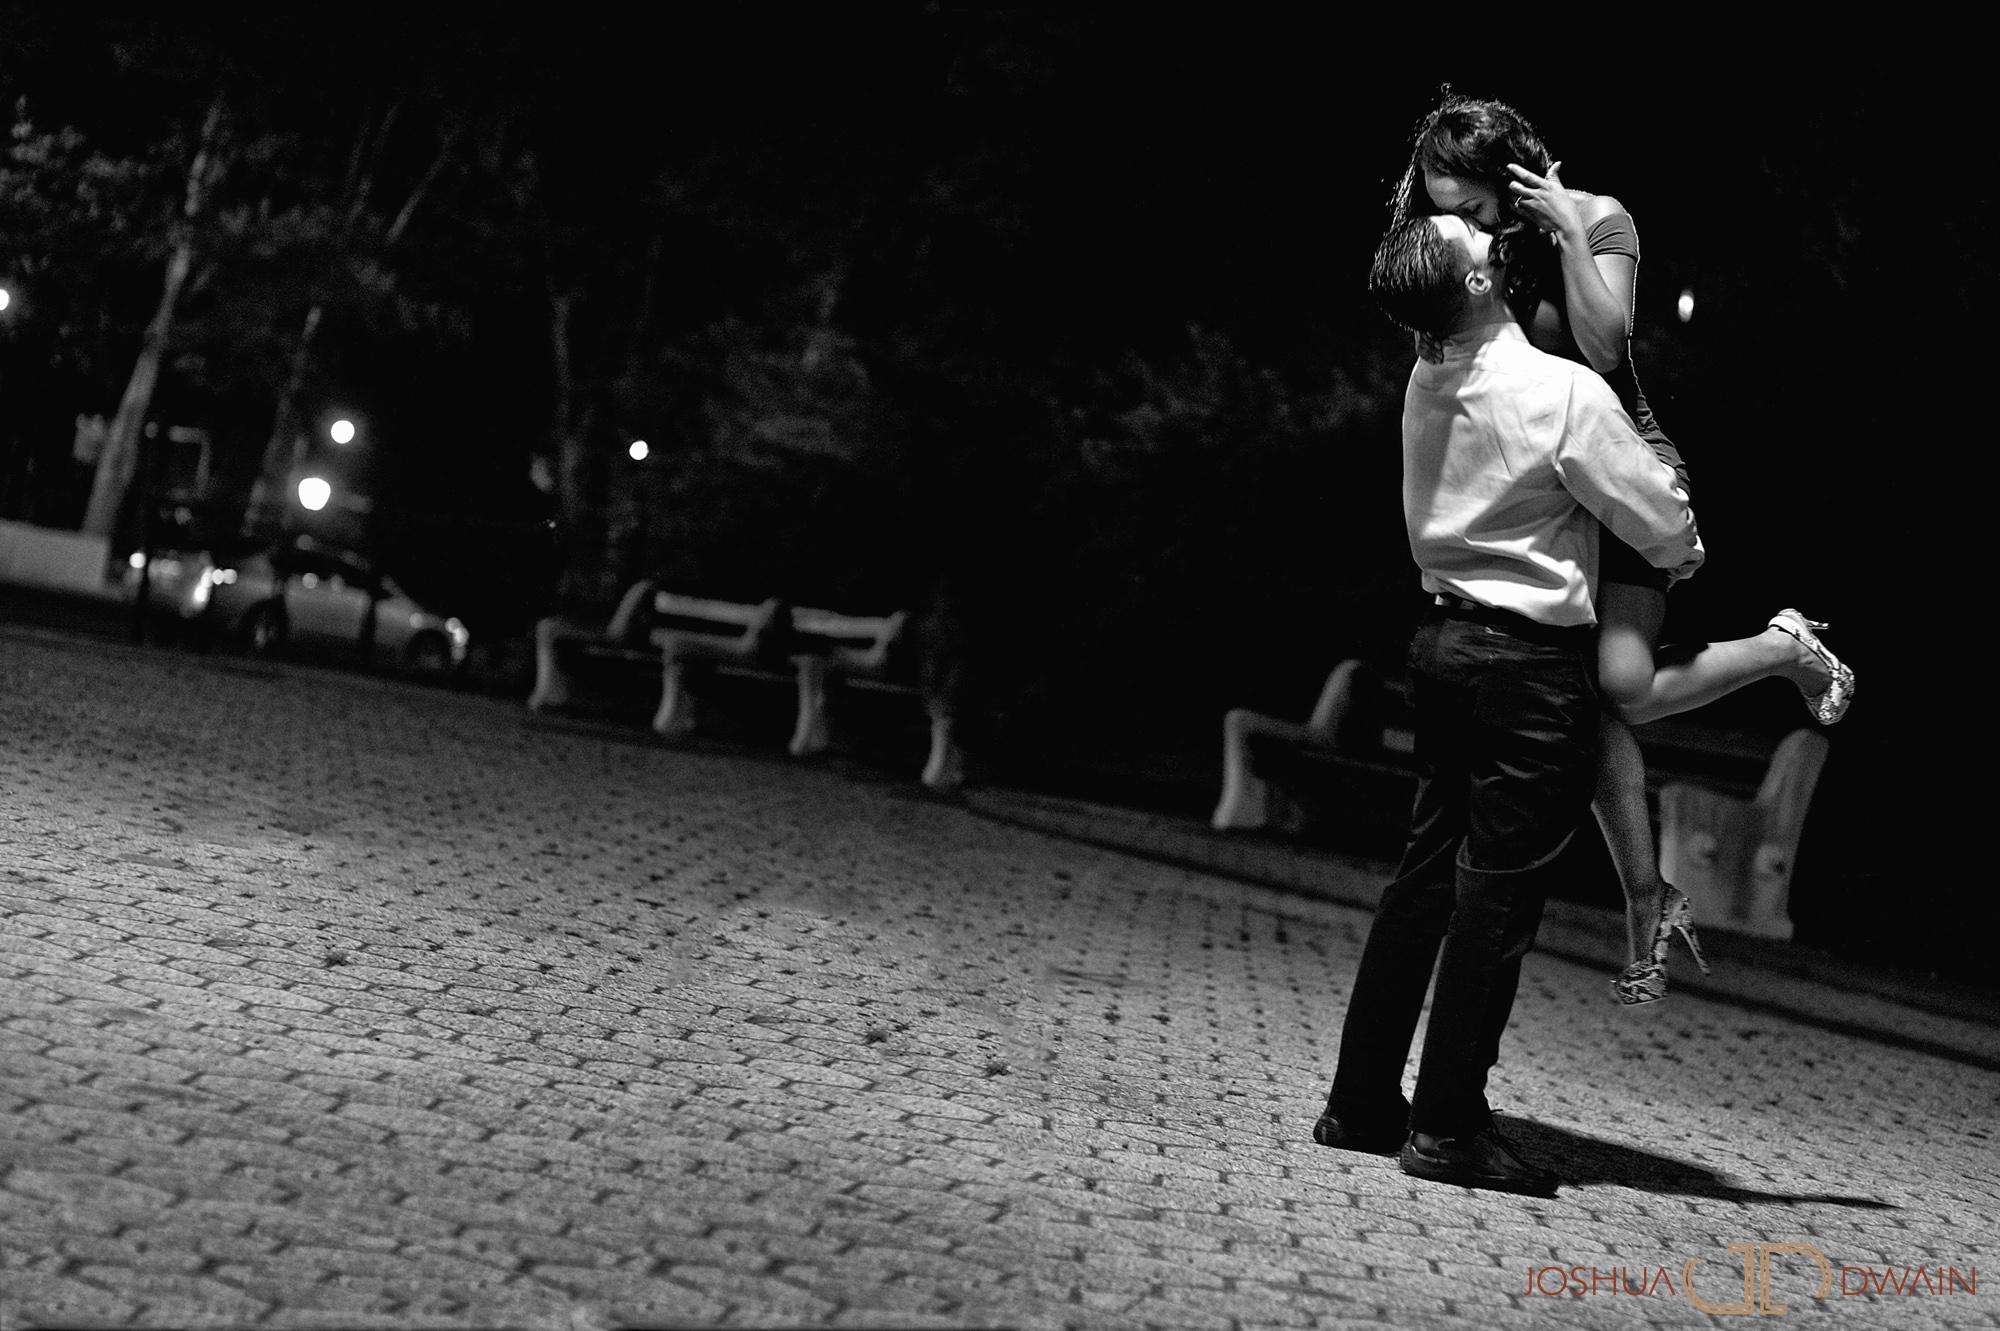 hyasmine-mohammed-001-movie-theaterbrooklyn-ny-engagement-photographer-joshua-dwain-2012-04-27_hm_151x